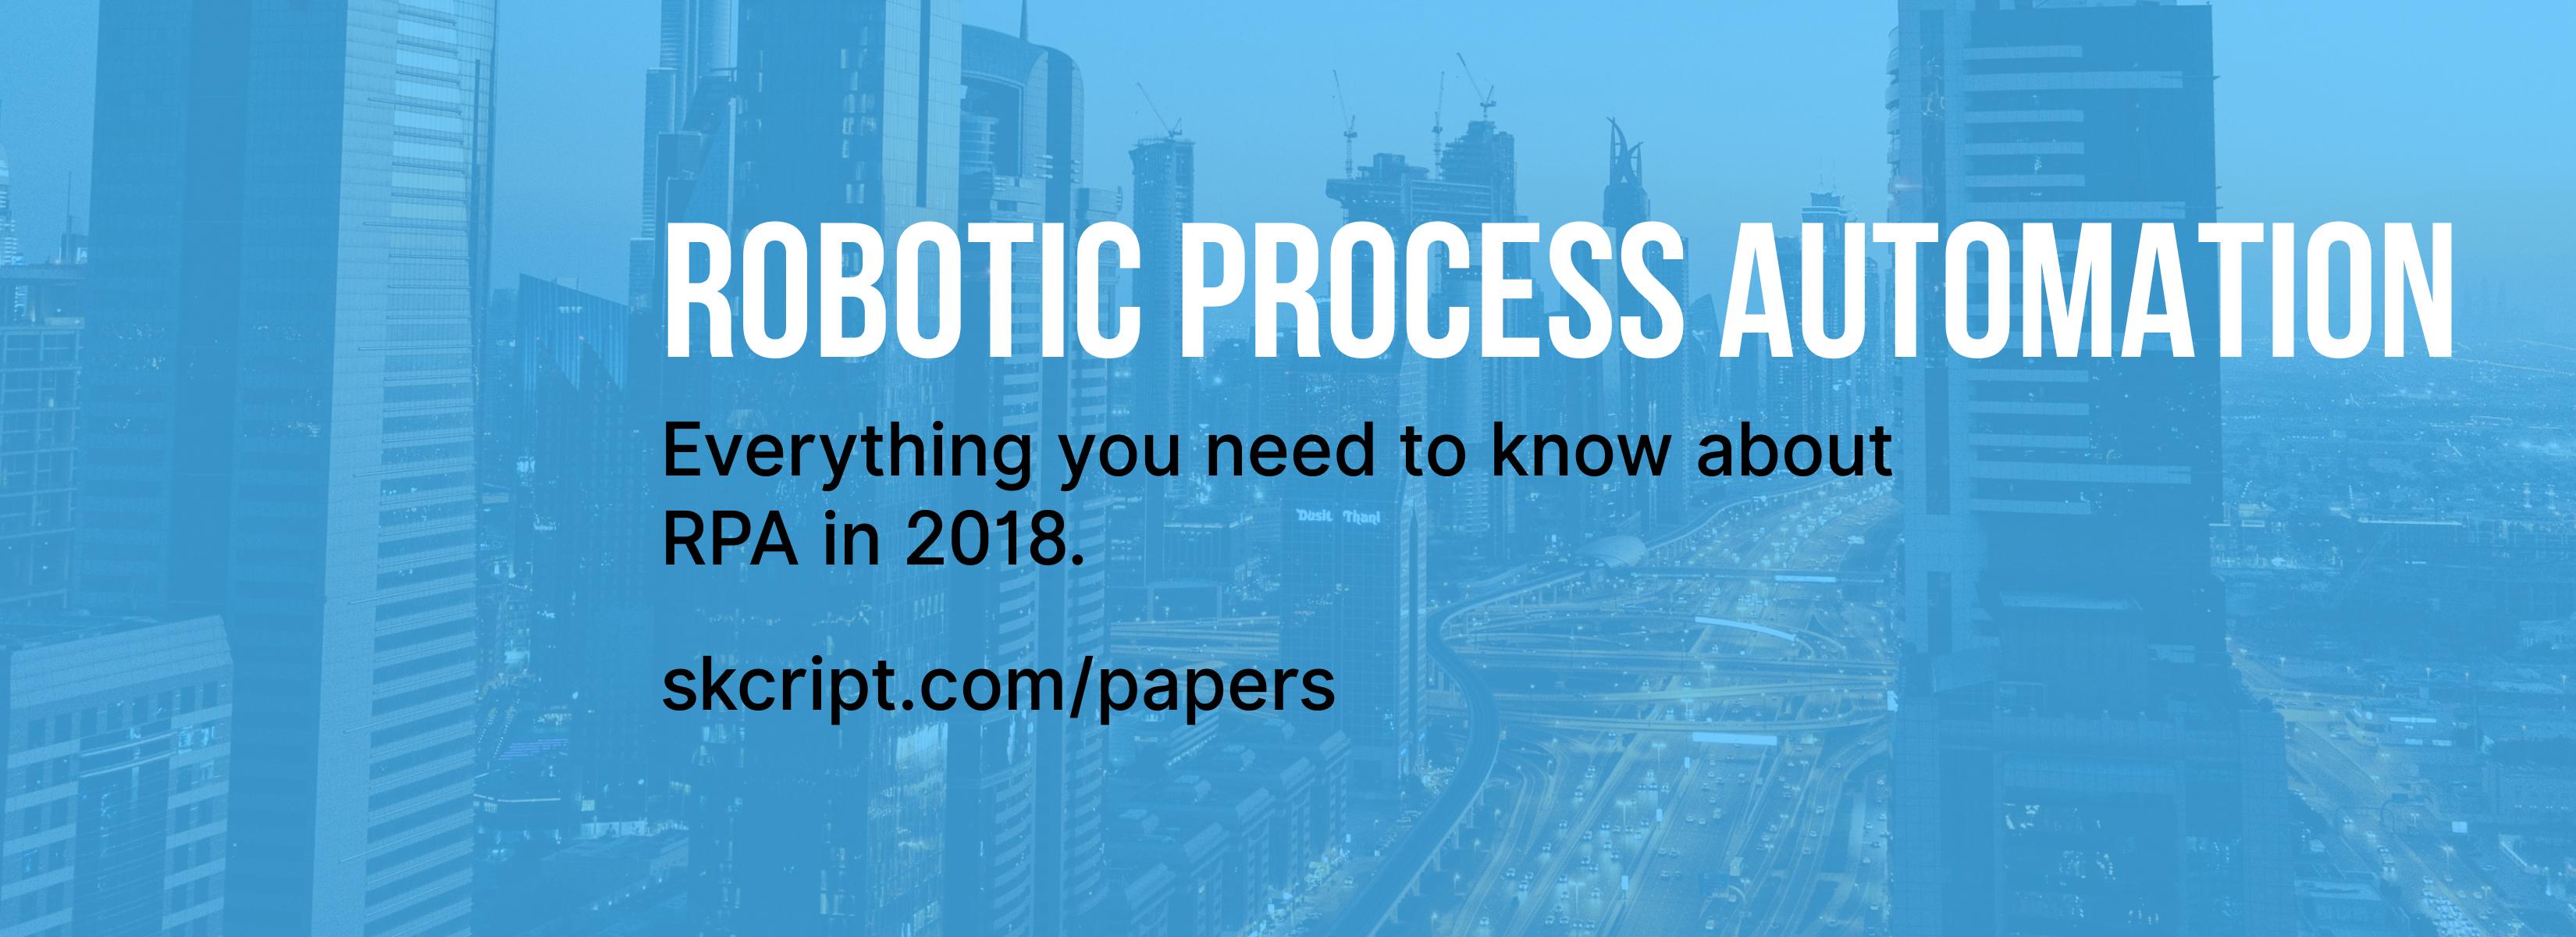 Robotic Process Automation Whitepaper 2018